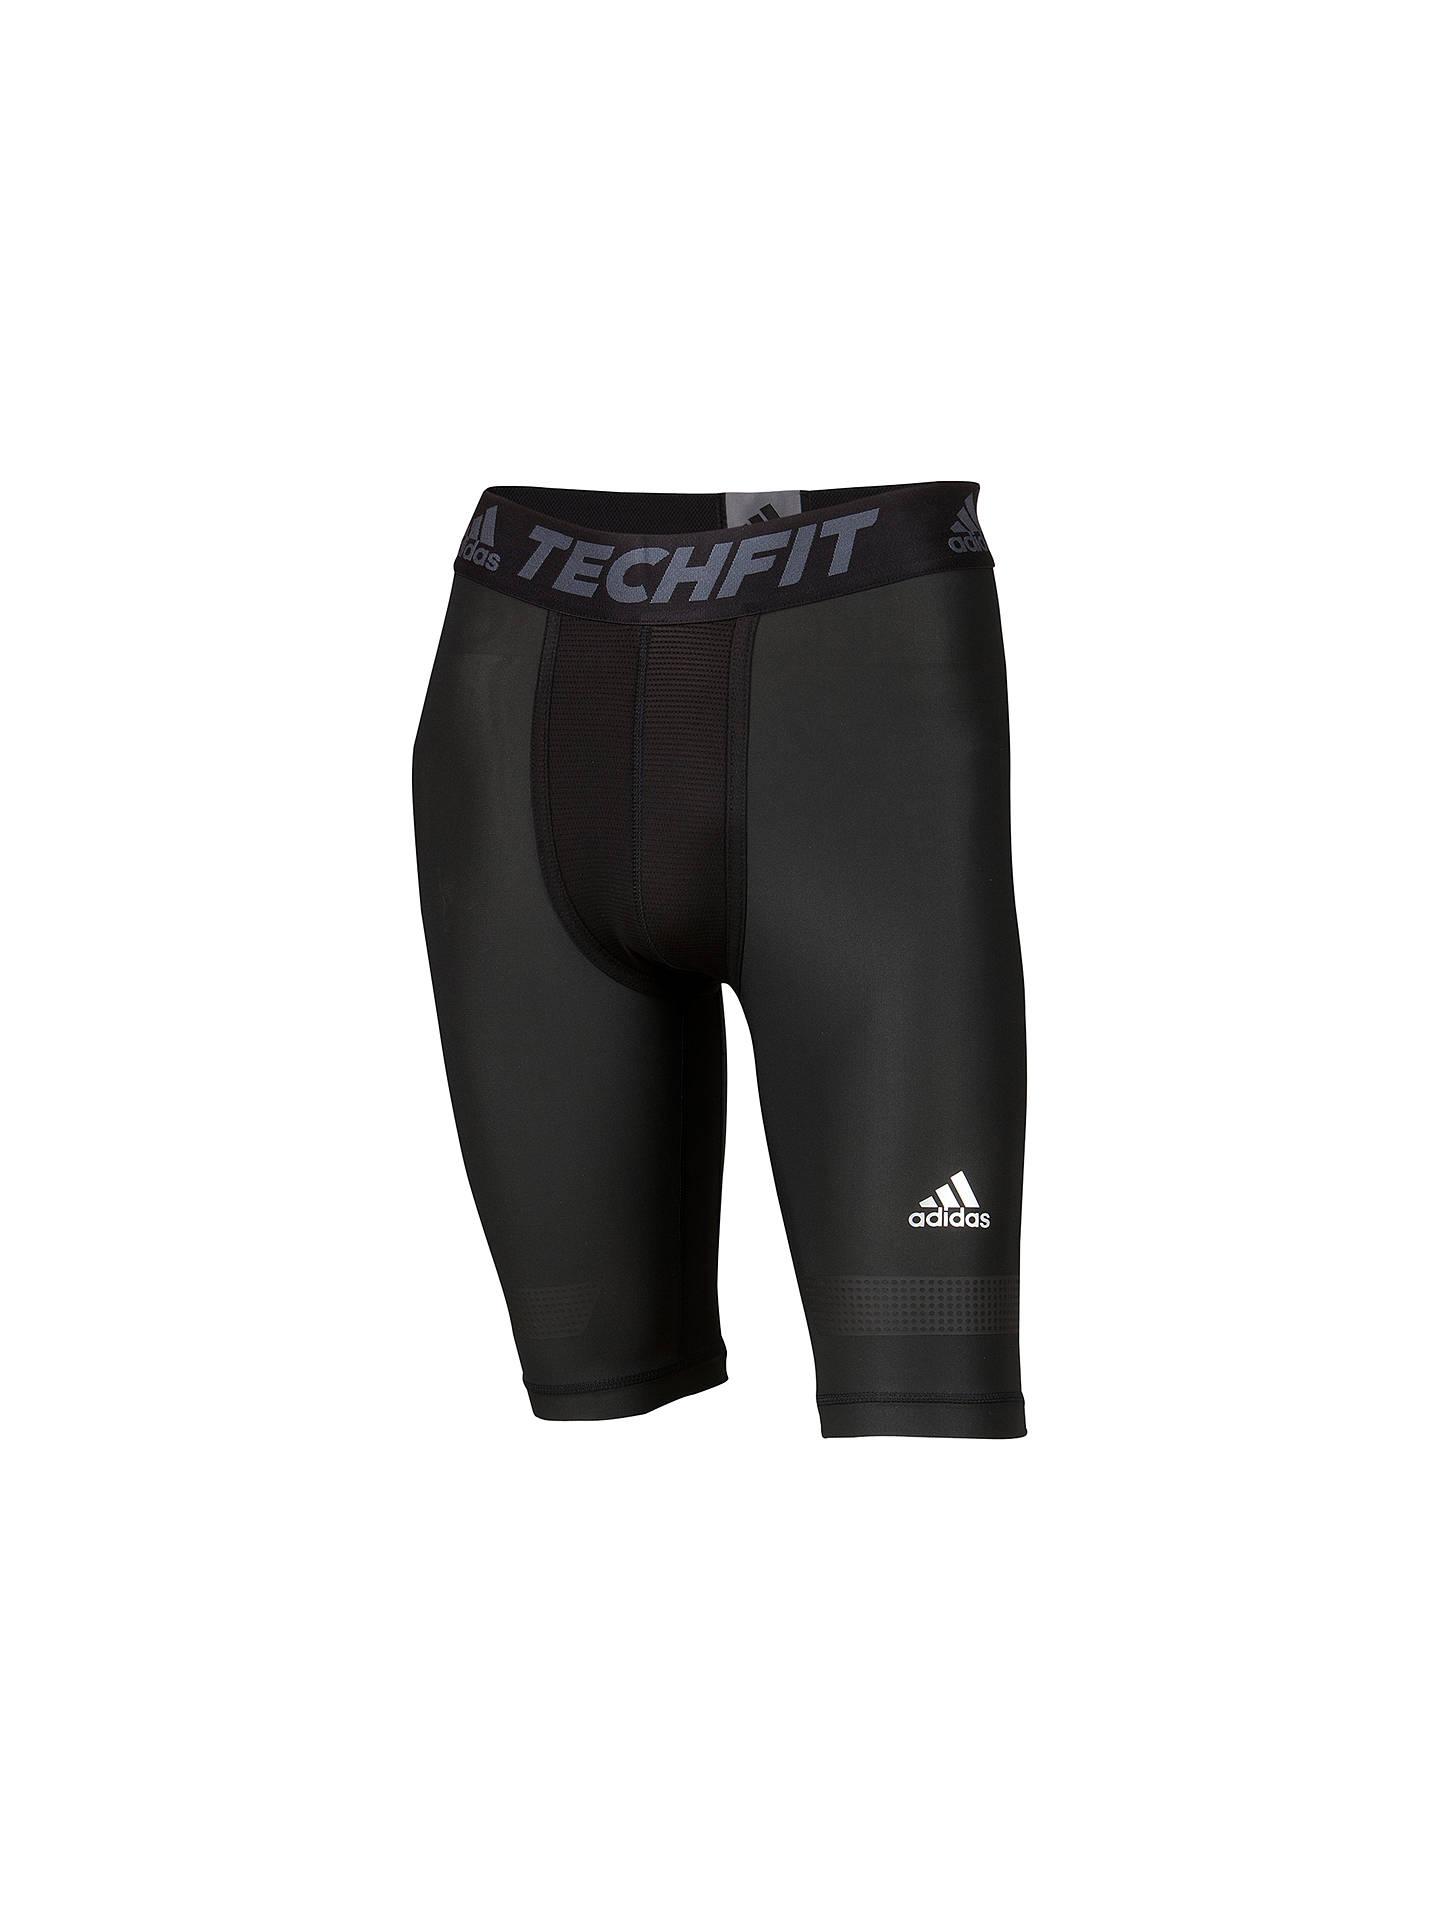 Men Adidas Mens Techfit Chill Short 7/9 Pants